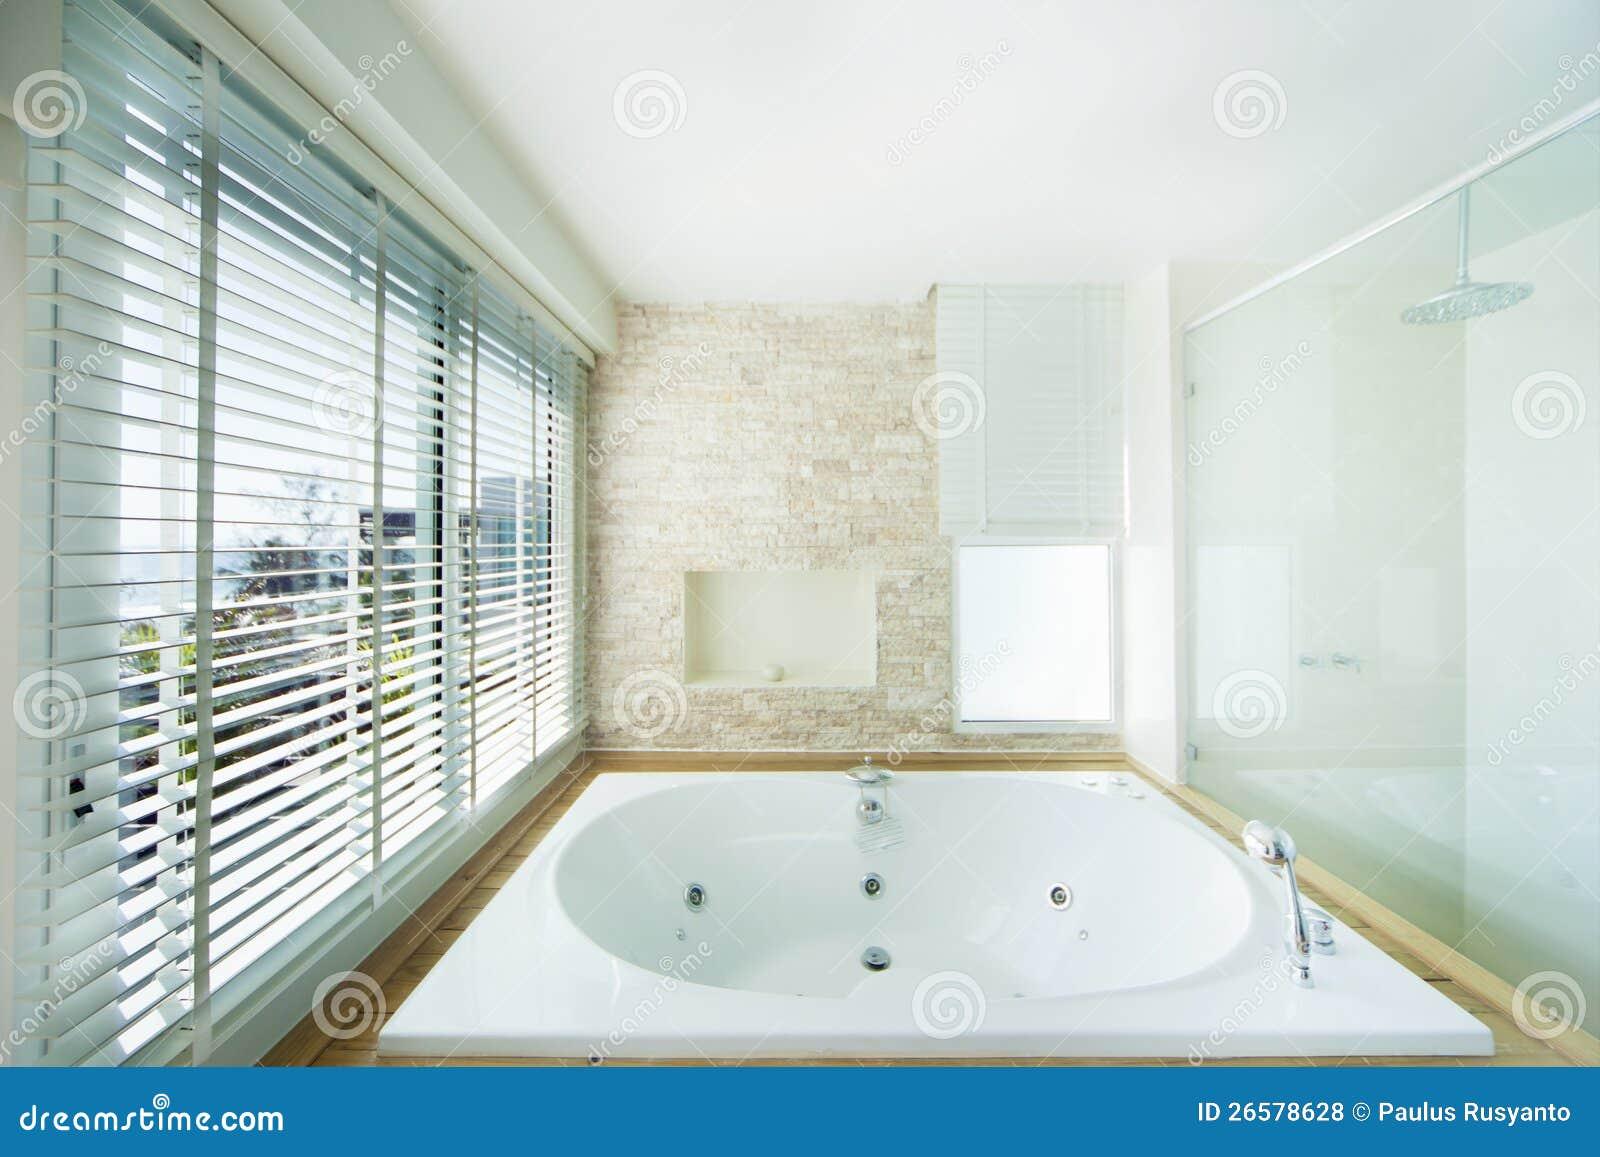 Luxury bathtub royalty free stock photos image 26578628 - Vasche da bagno di lusso ...